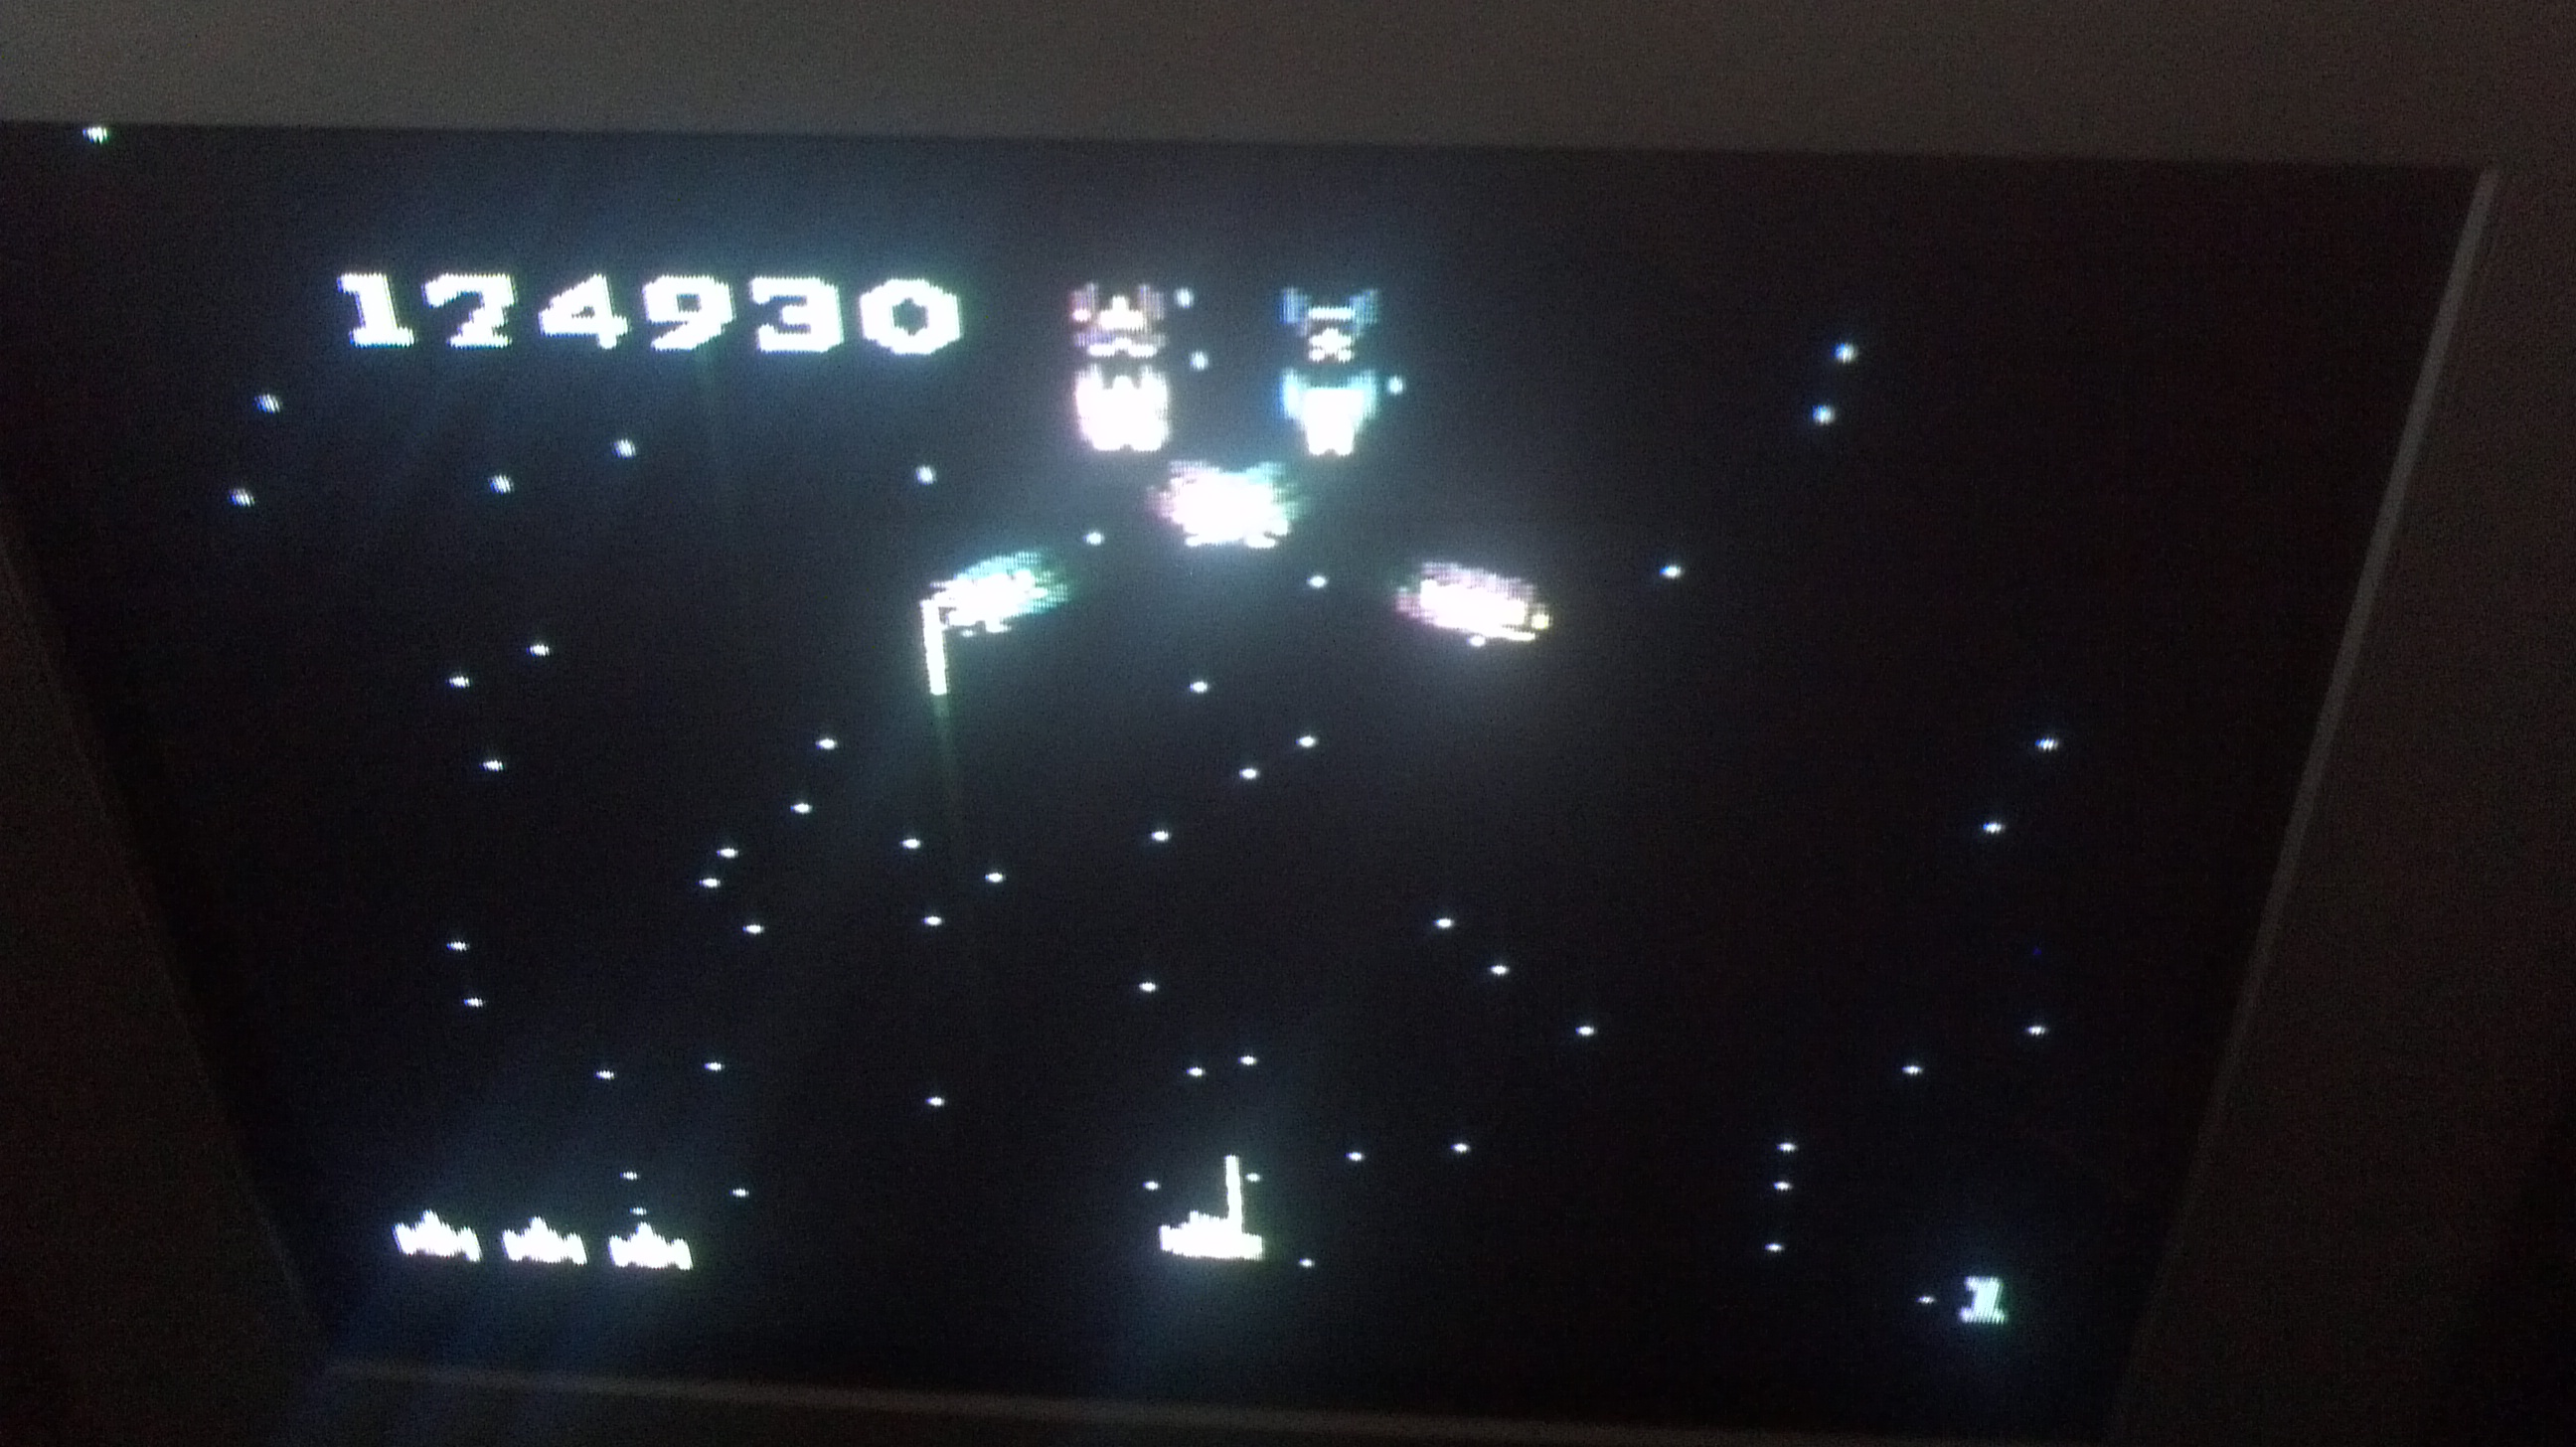 Liduario: Galaga: Advanced (Atari 7800) 174,930 points on 2014-05-02 08:35:56